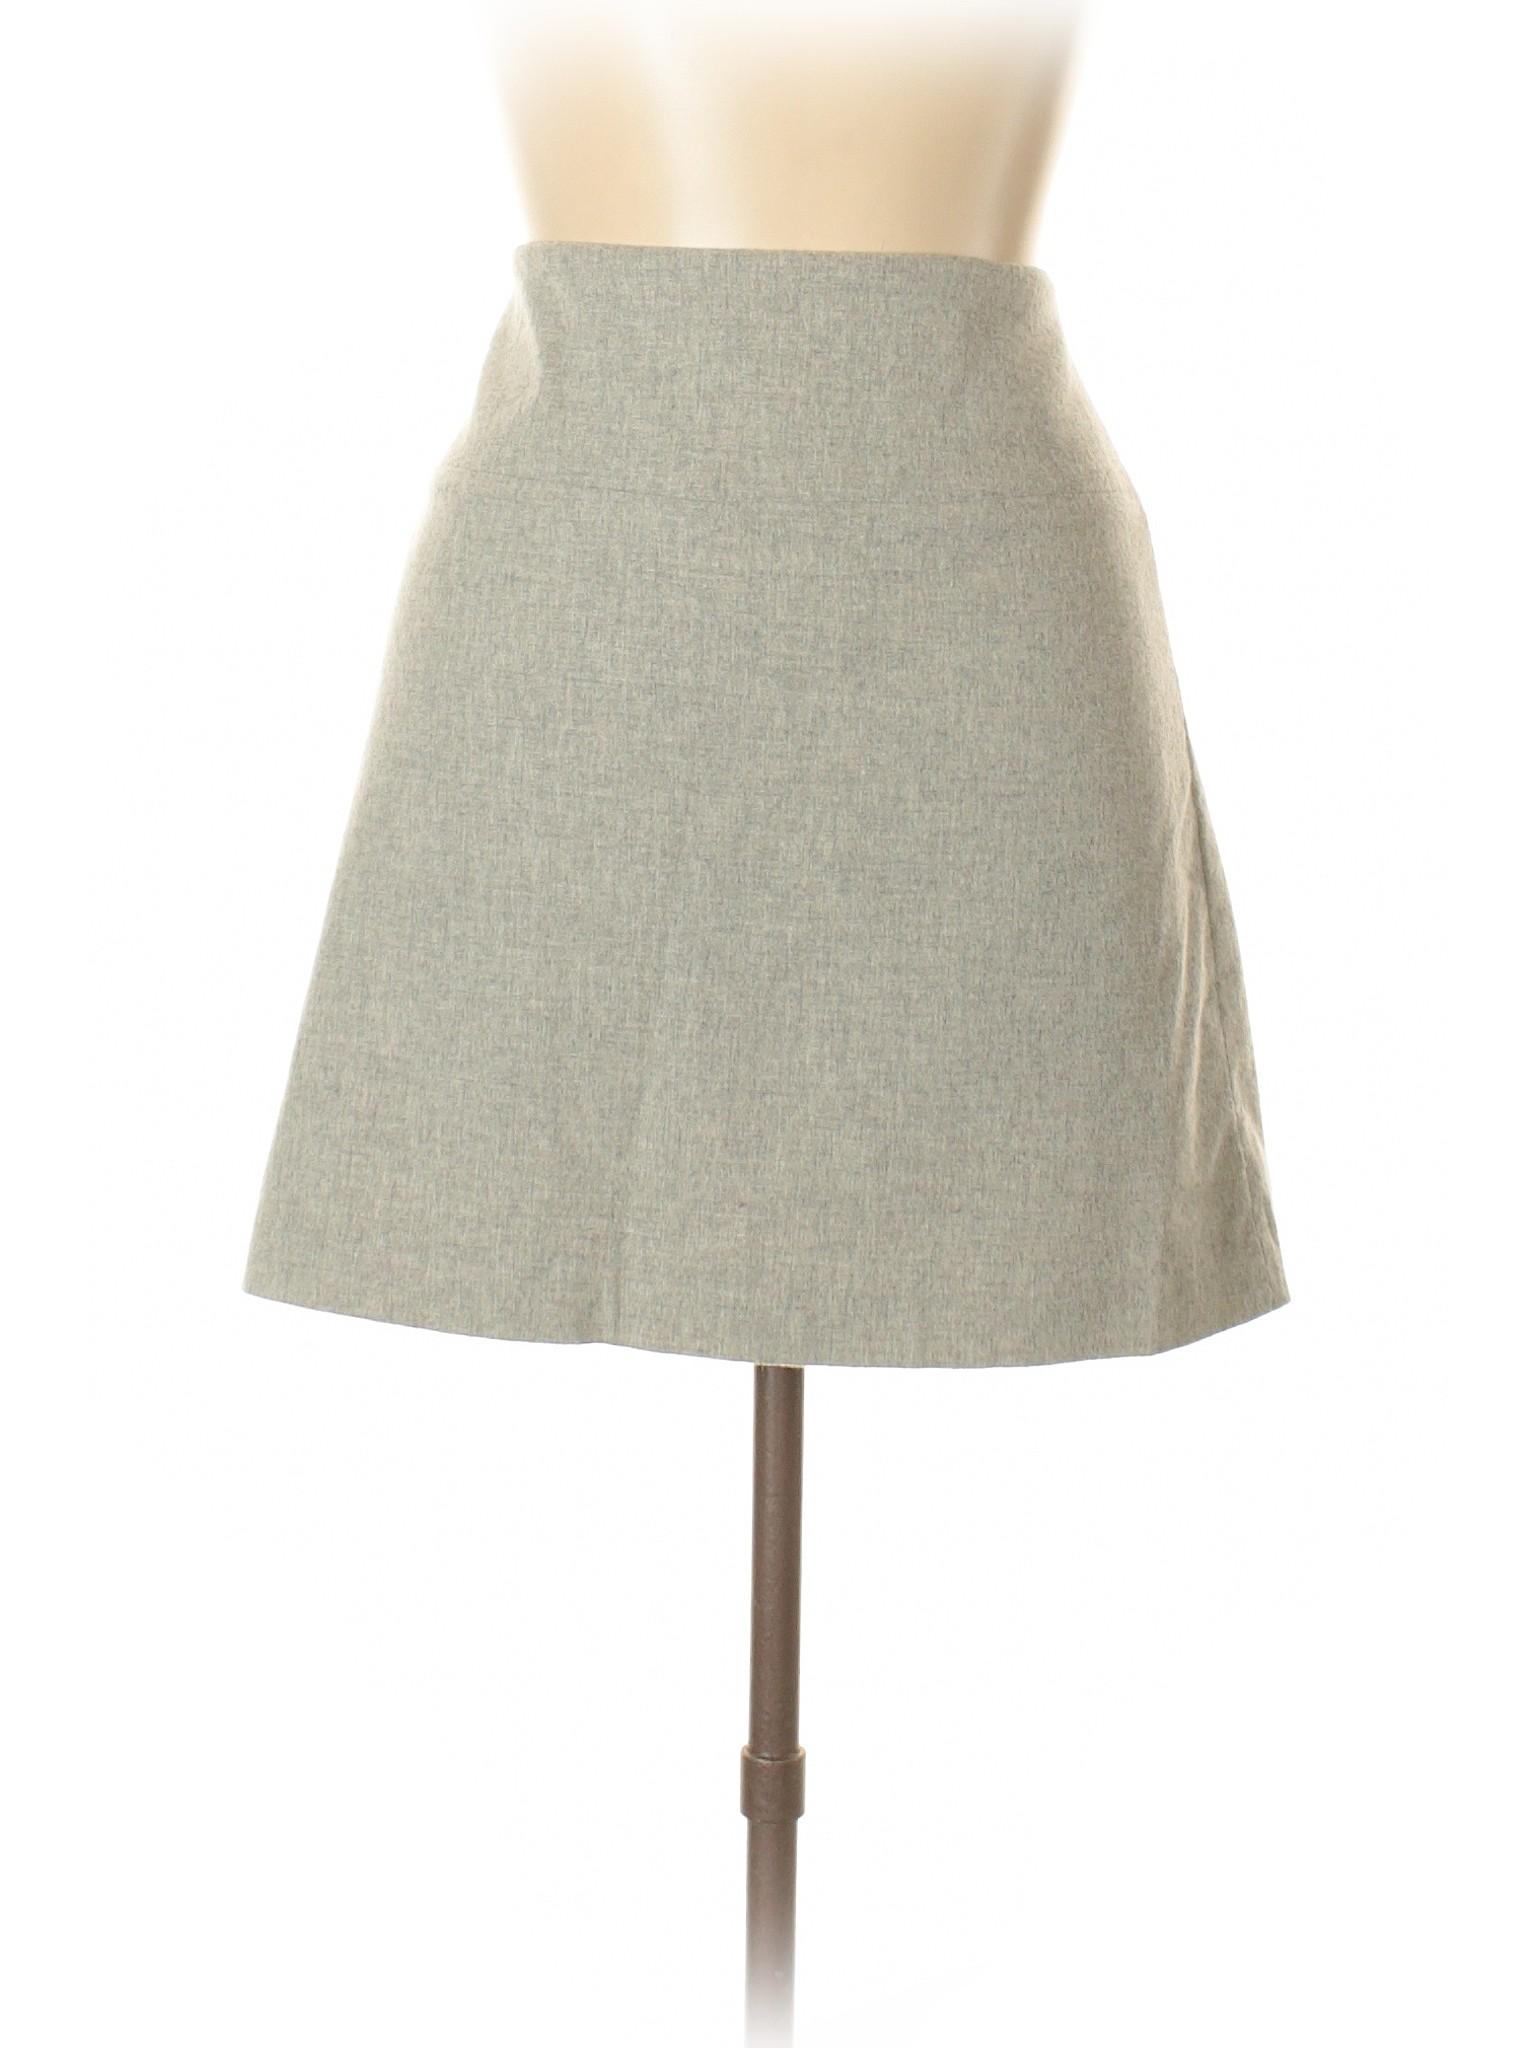 Boutique Boutique Boutique Skirt Wool Wool Wool Boutique Wool Boutique Skirt Skirt Wool Skirt gxEfqdAv